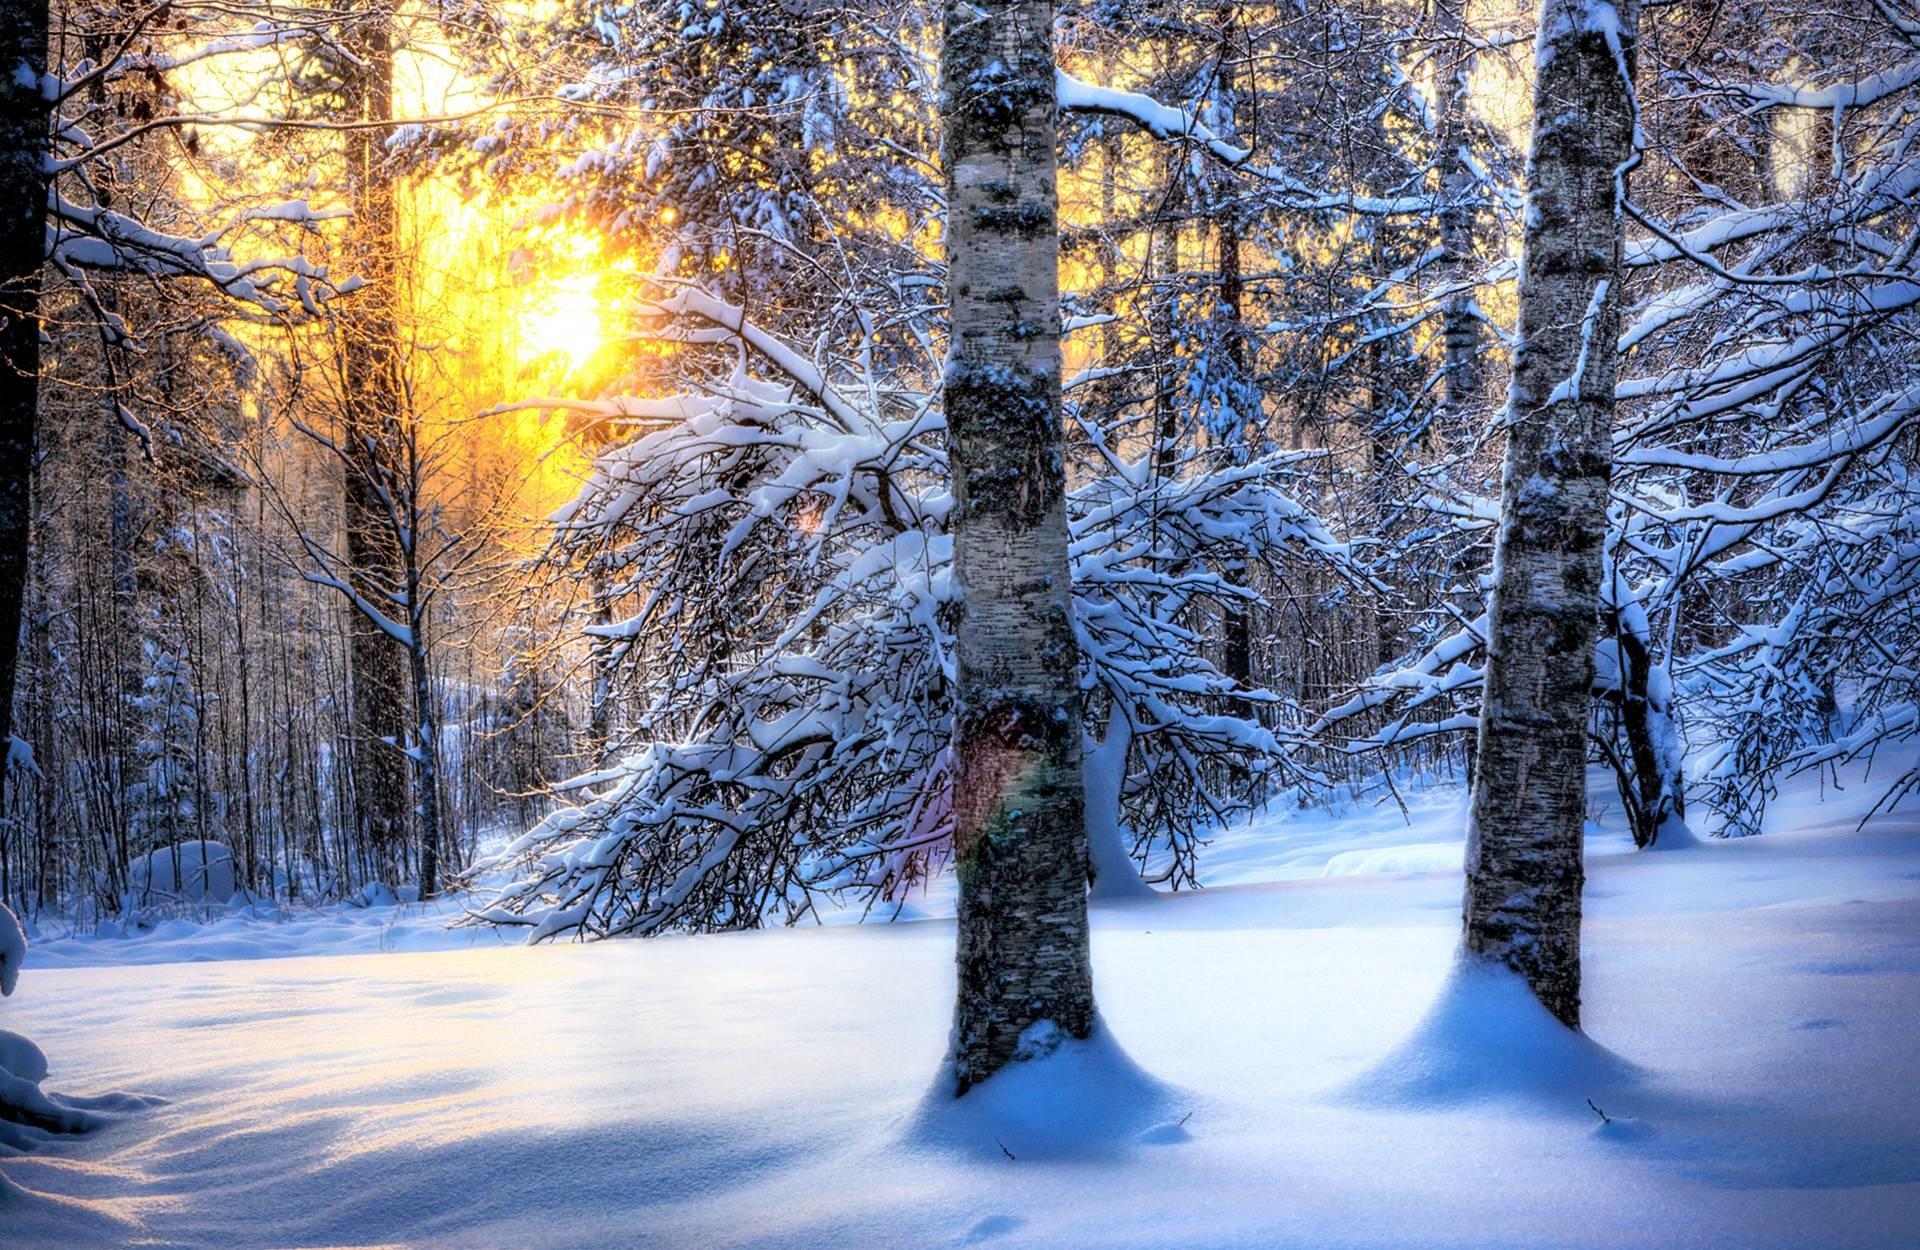 Free winter desktop wallpaper downloads.